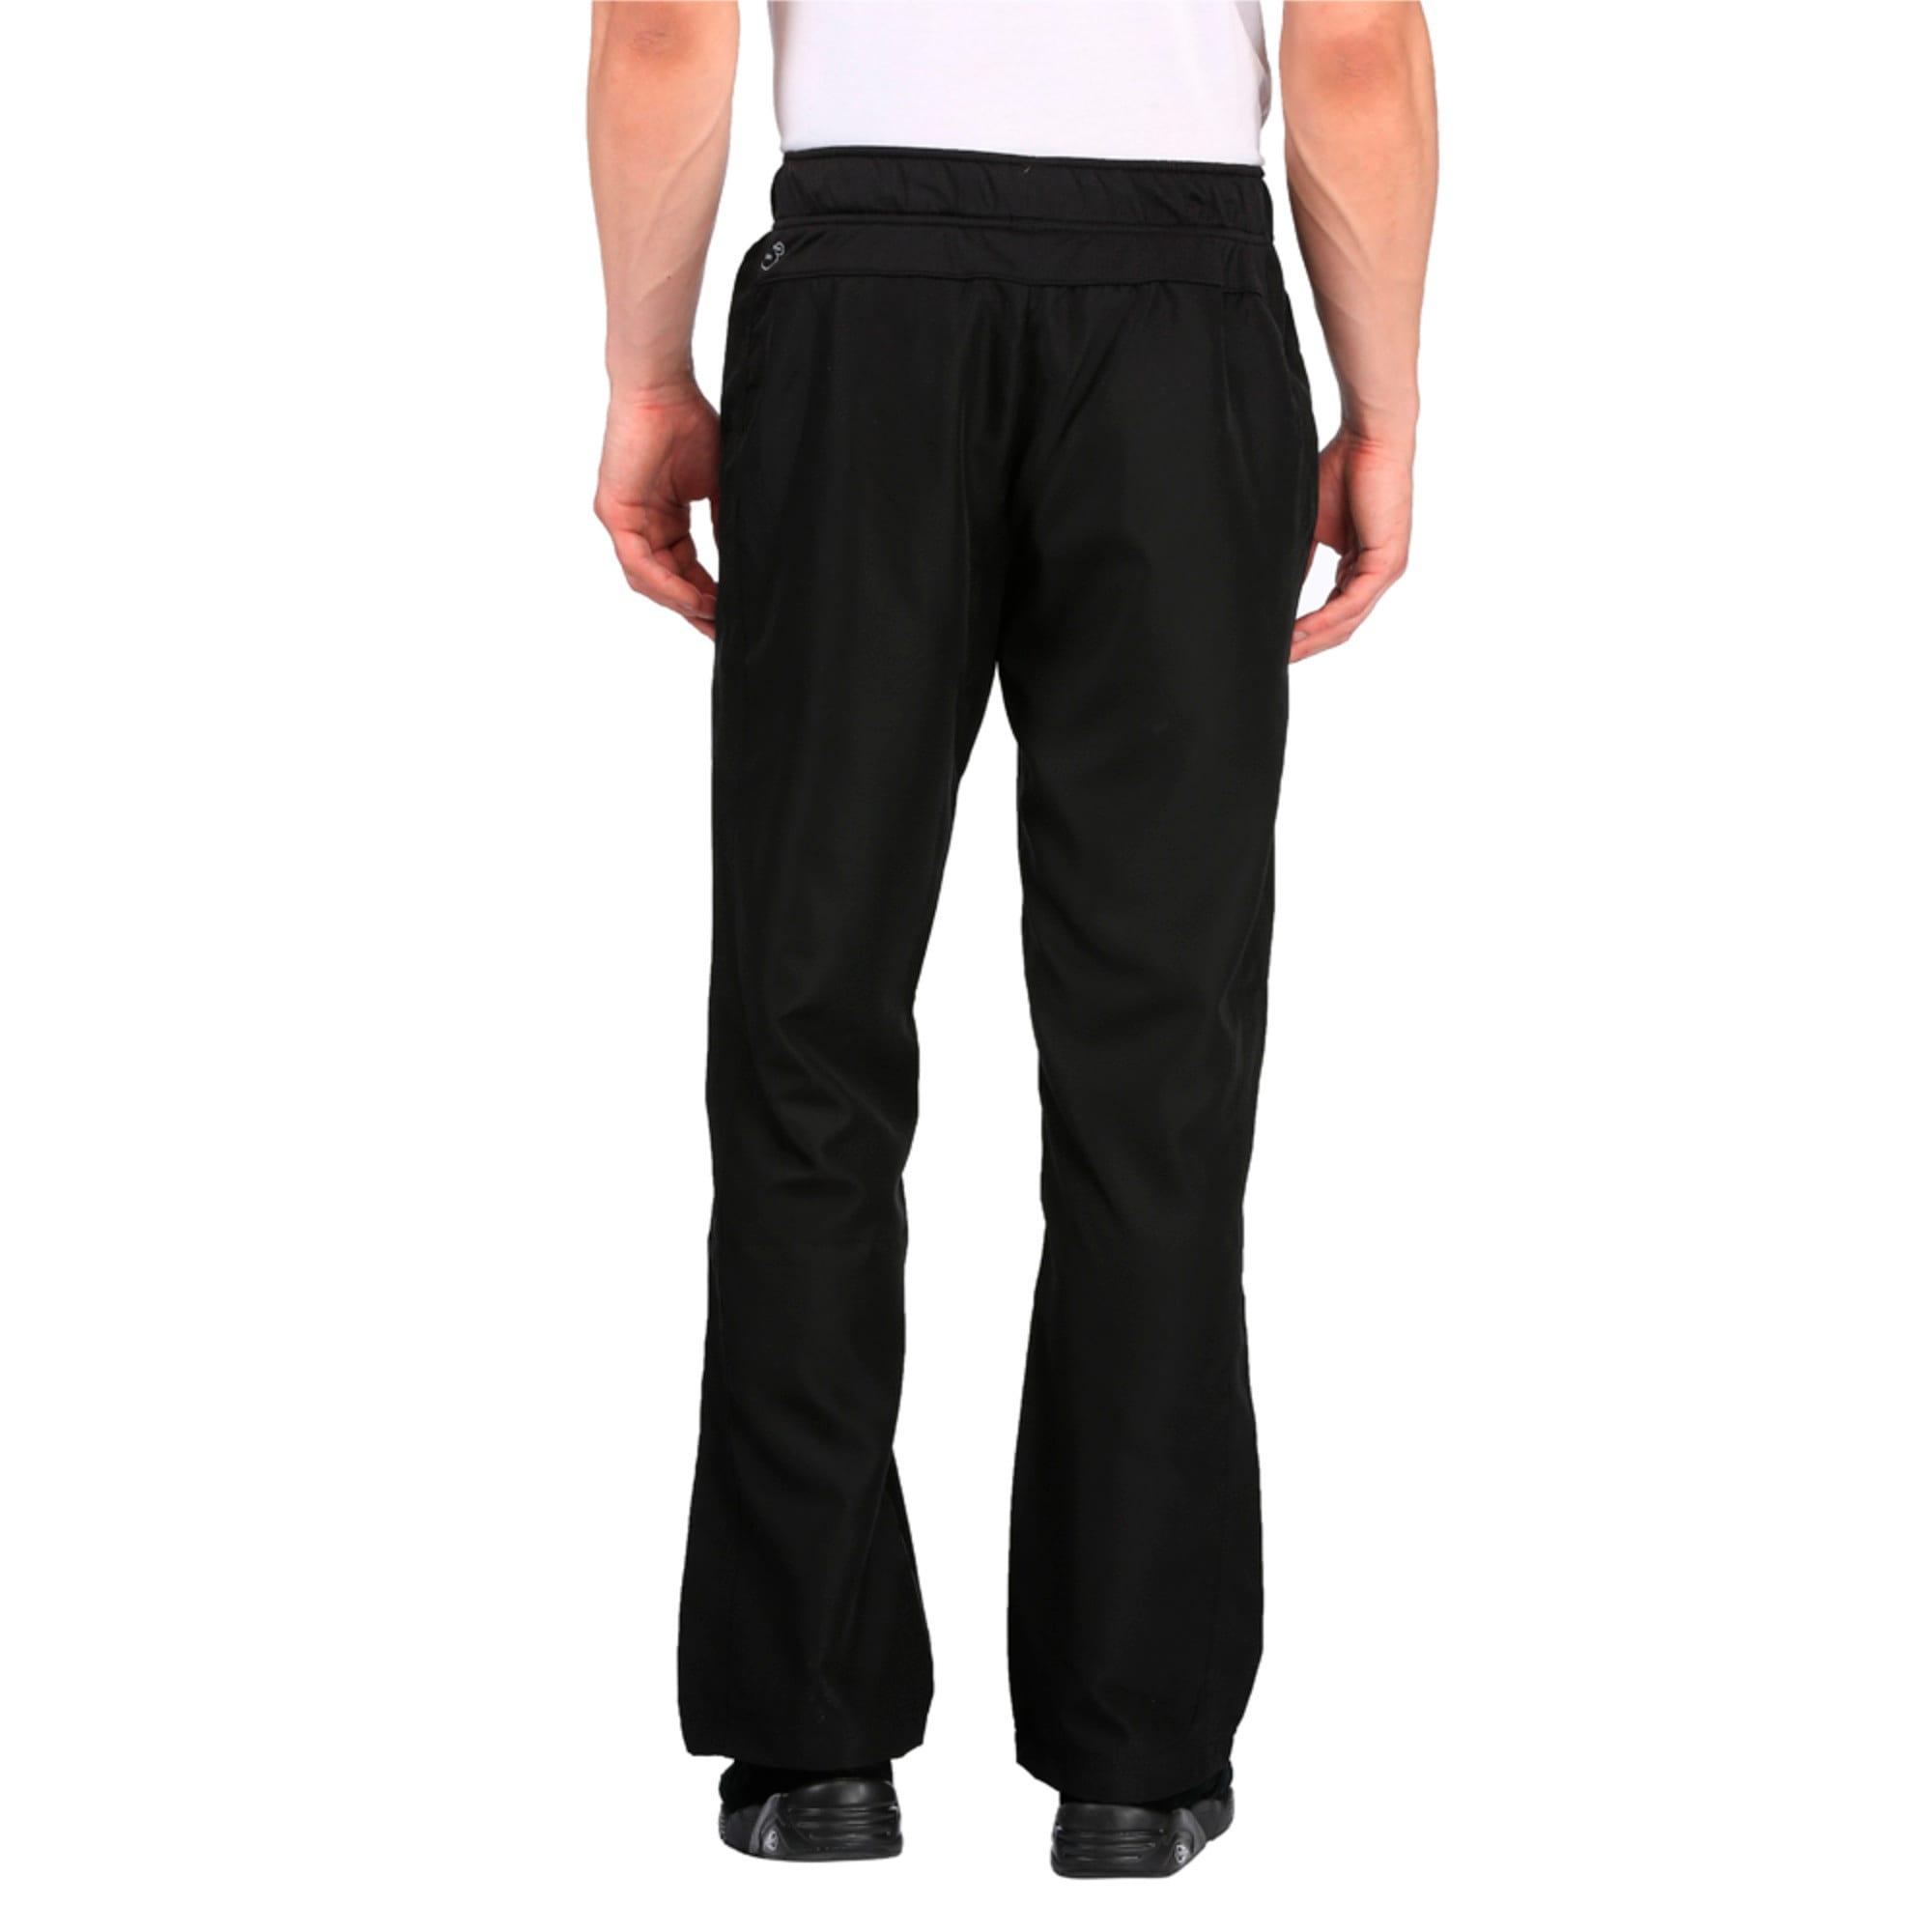 Thumbnail 4 of Essential Woven Pant, Puma Black, medium-IND